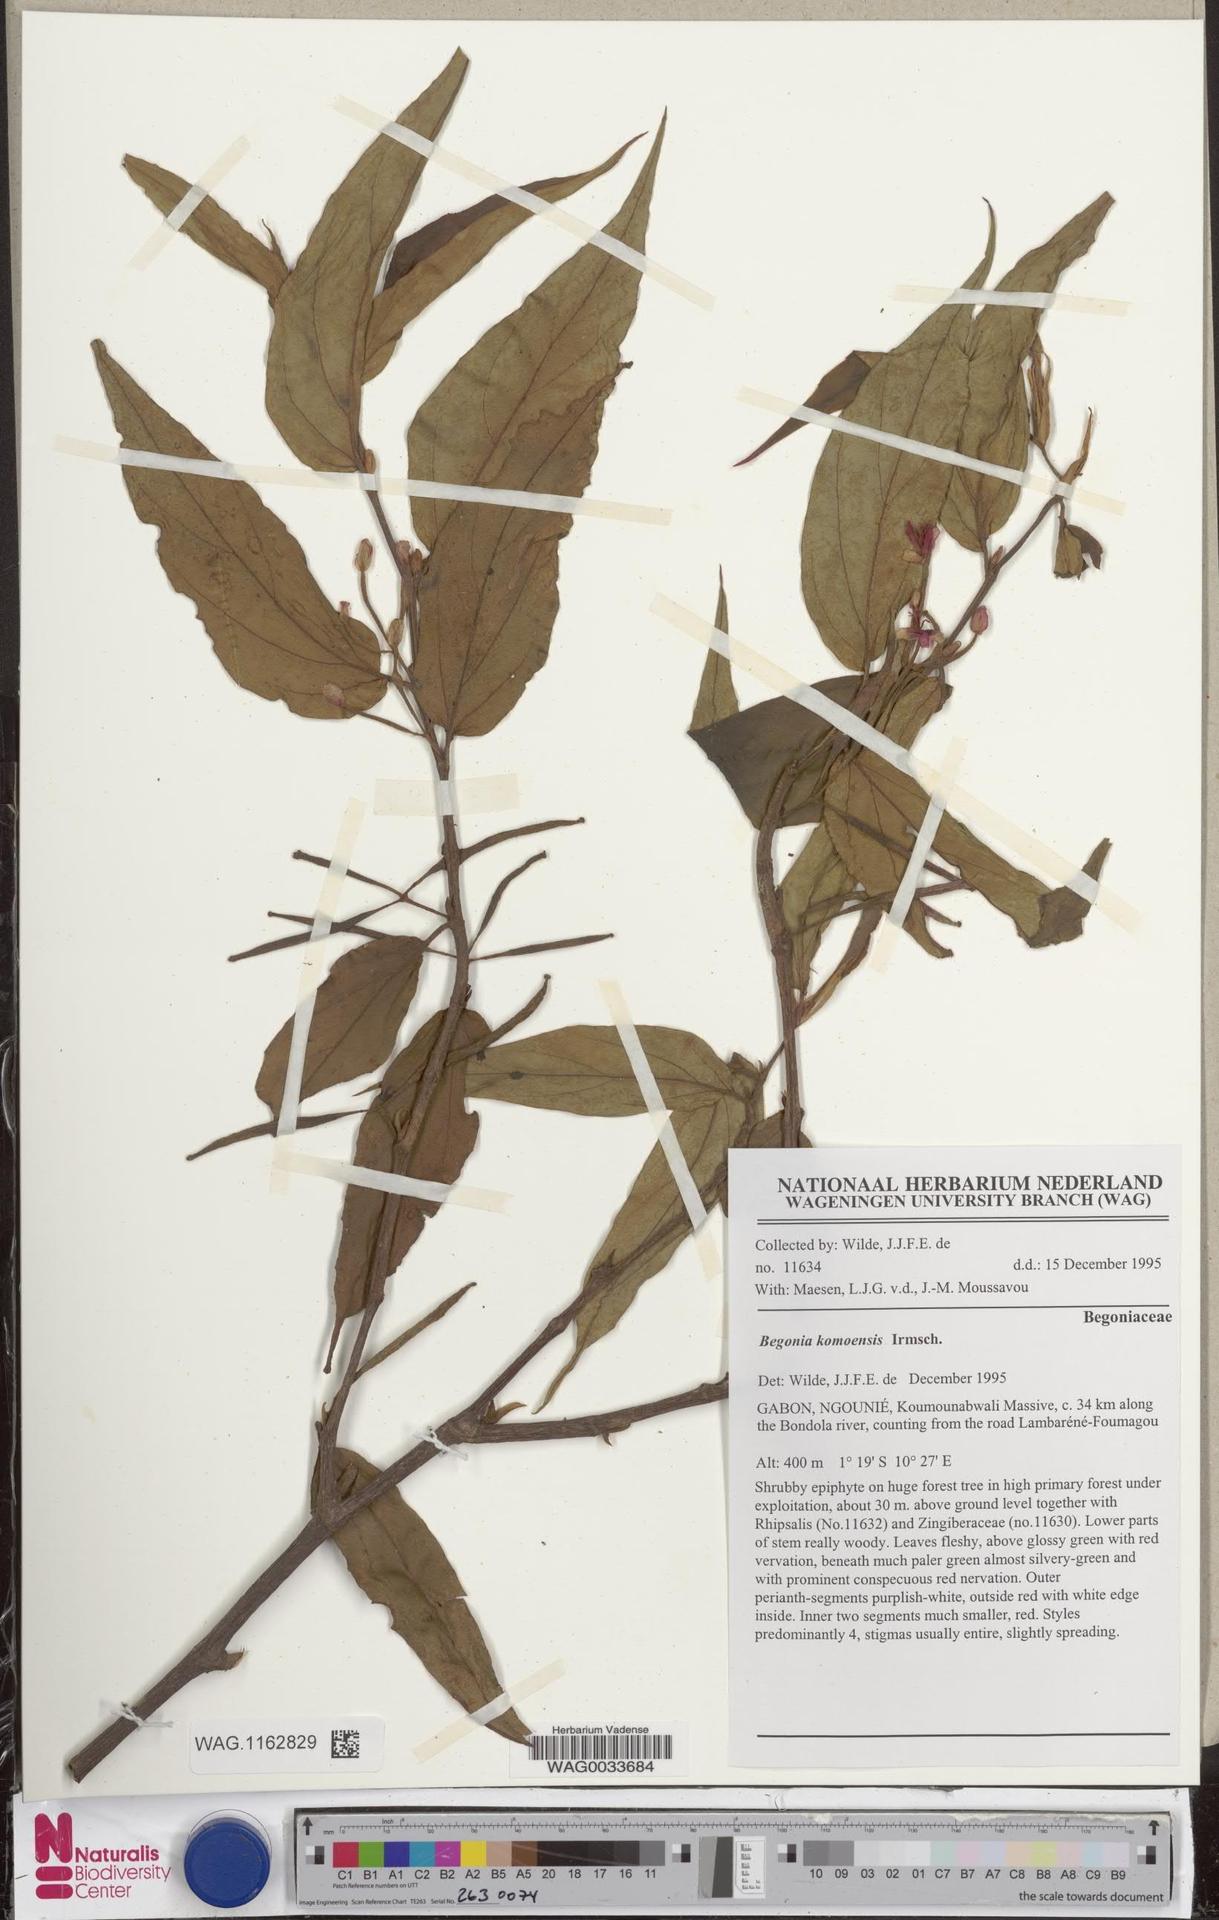 WAG.1162829   Begonia komoensis Irmsch.